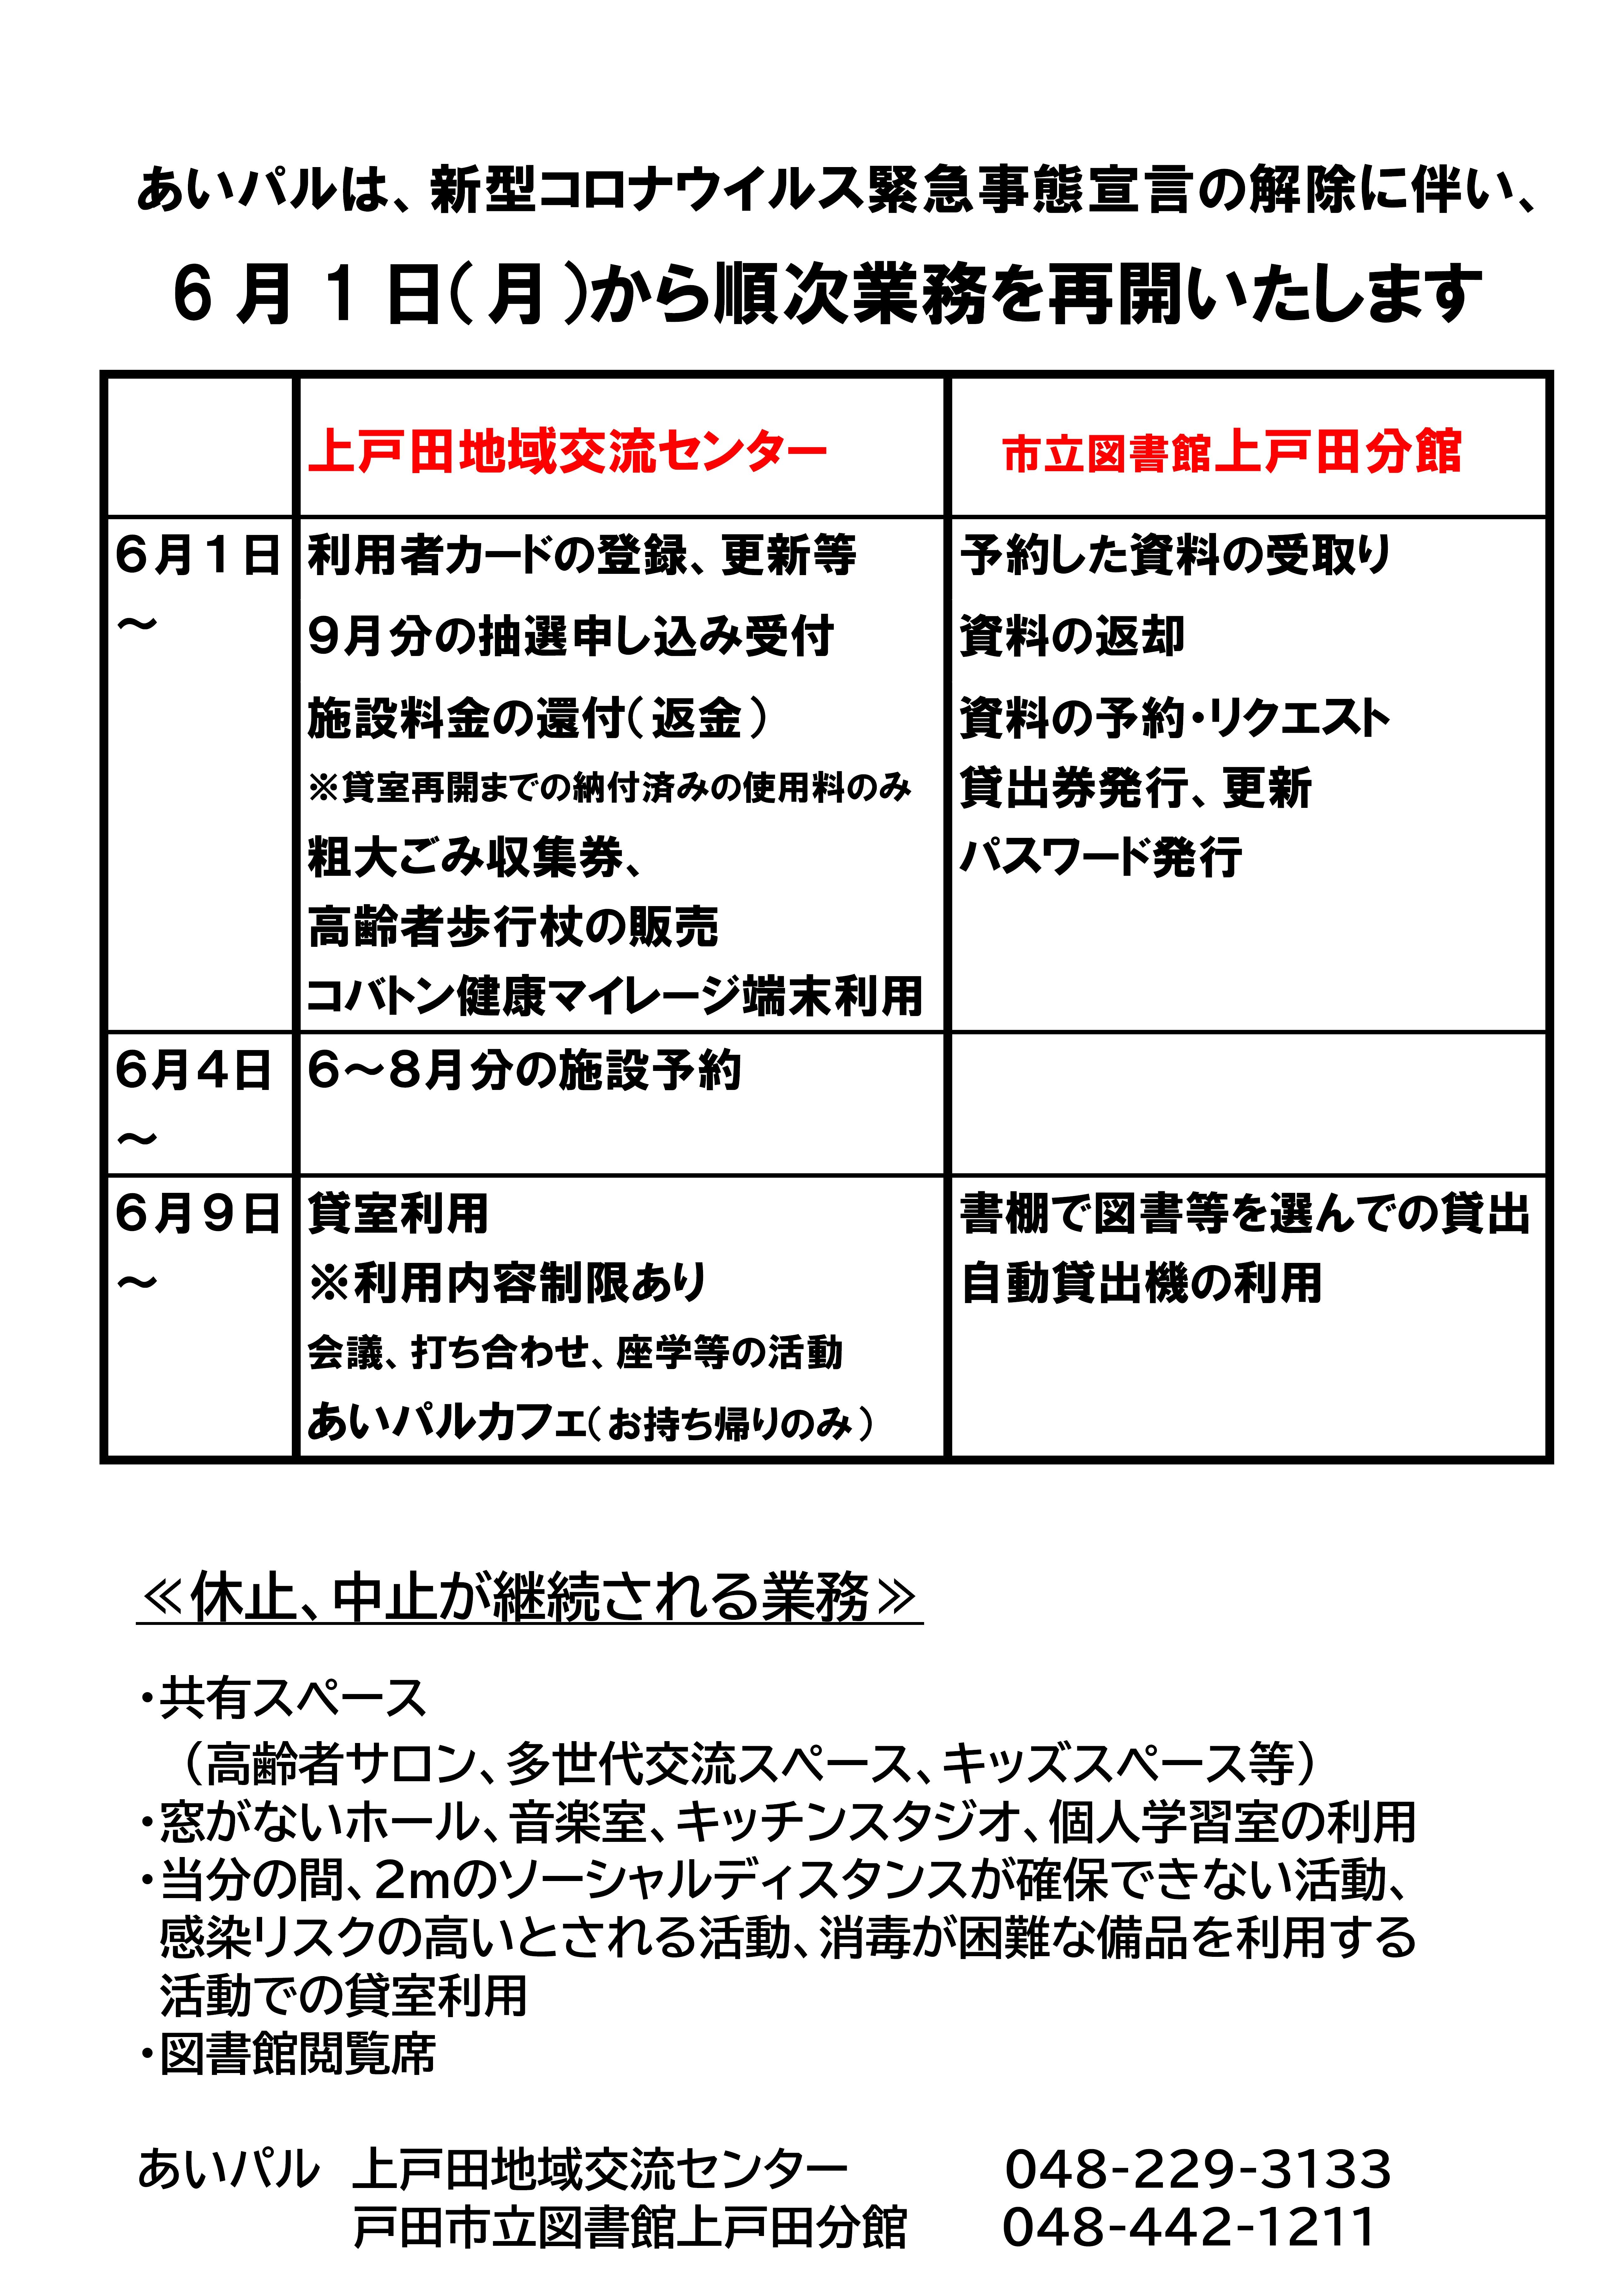 https://www.ipal-friendship.net/gyoumusaikaiannnai.jpg